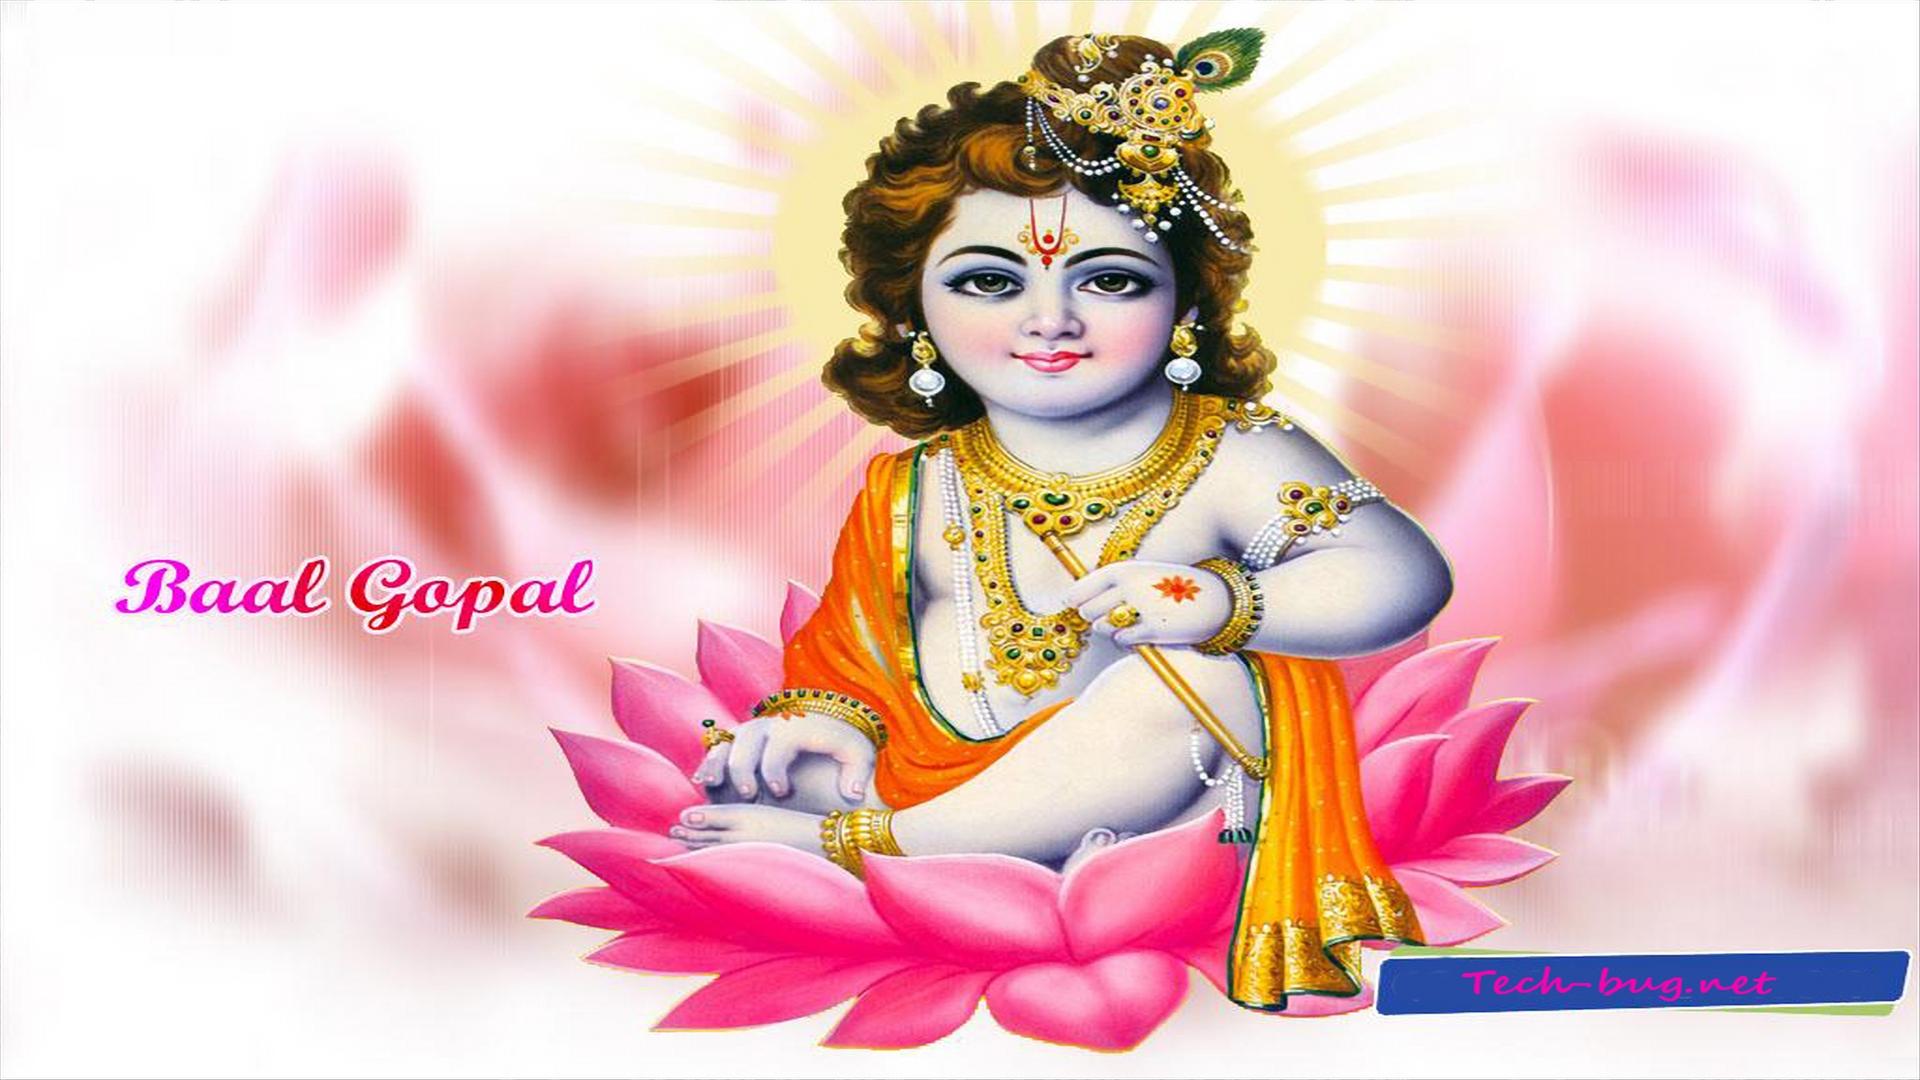 1408364779 krishna hinduism religion file www.wallpaperg.com